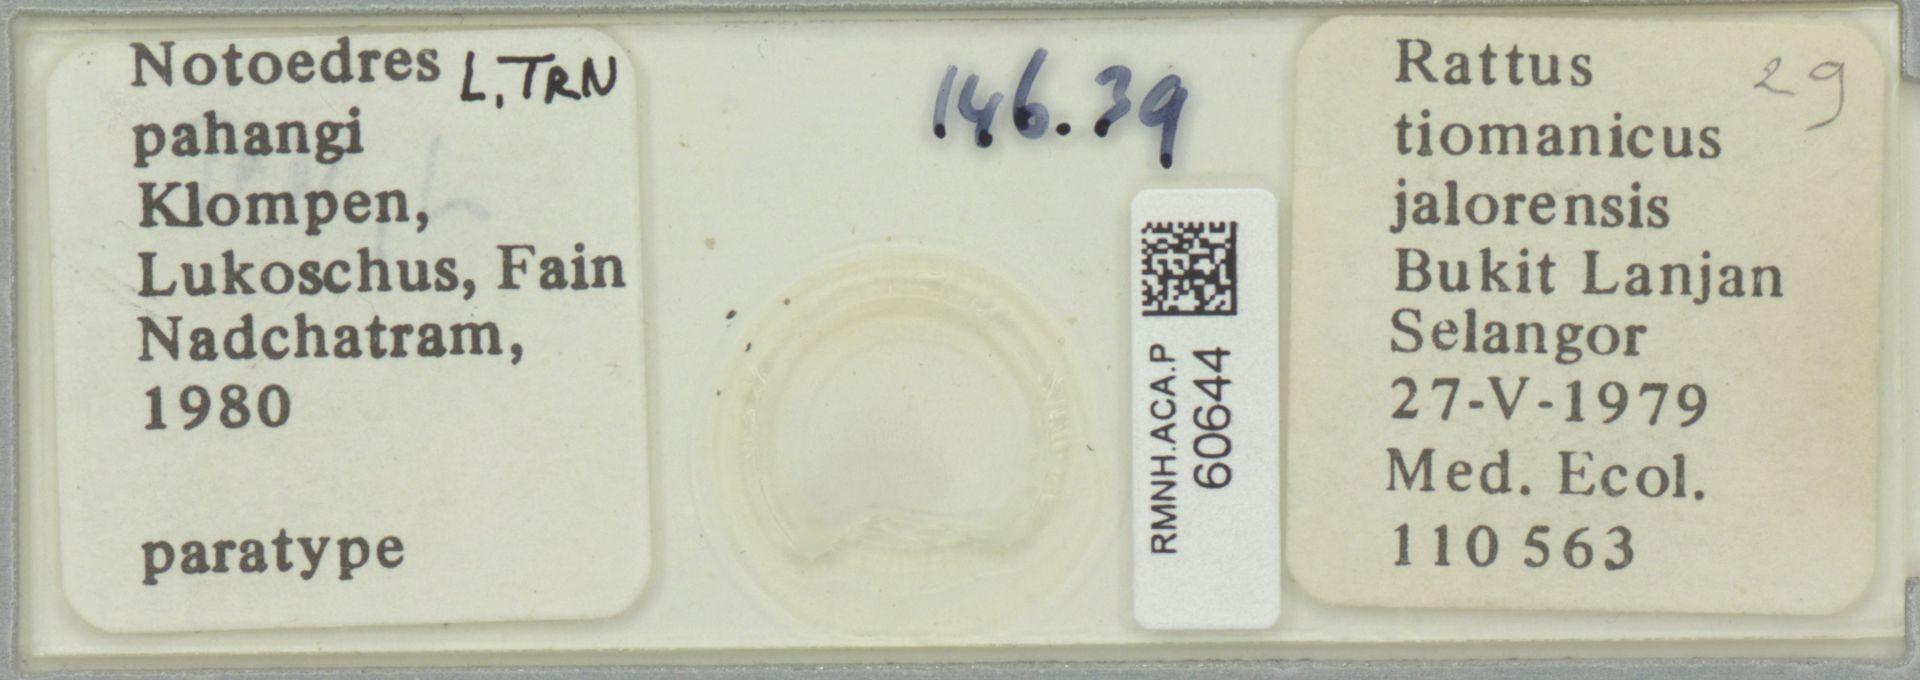 RMNH.ACA.P.60644 | Notoedres pahangi Klompen, Lukoschus, Fain Nadchatram, 1980